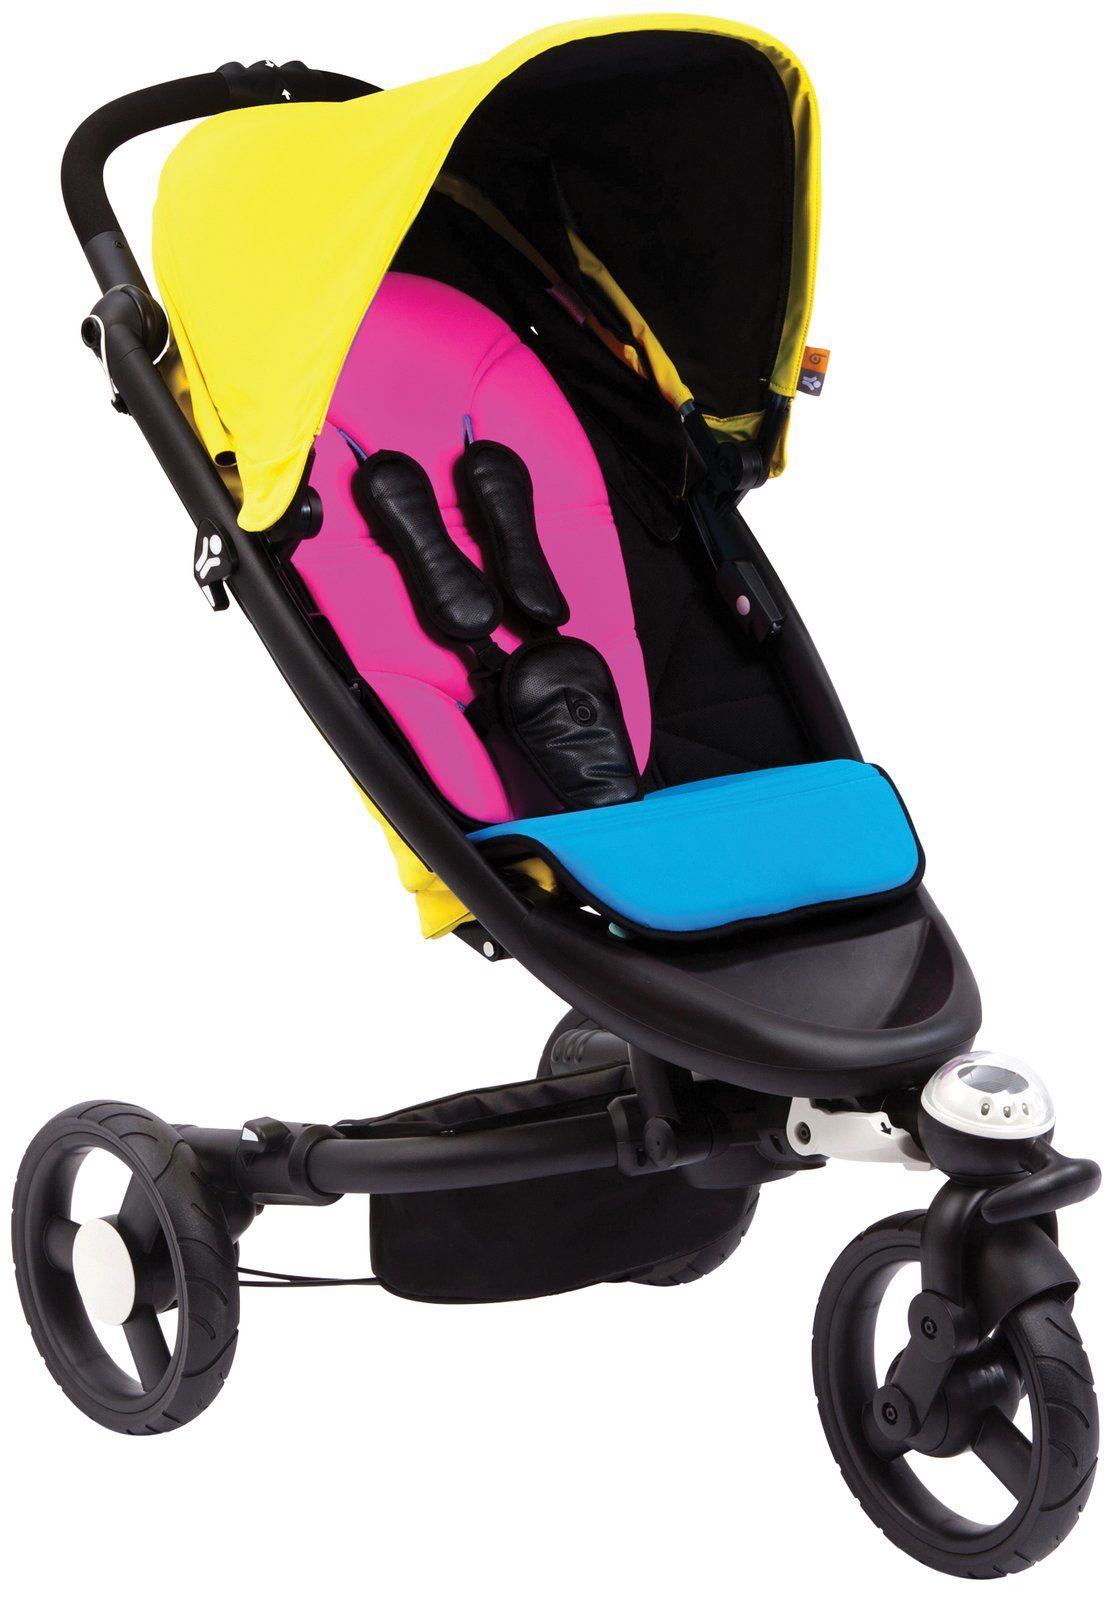 Bloom Zen stroller in CMYK seriously?! This stroller has